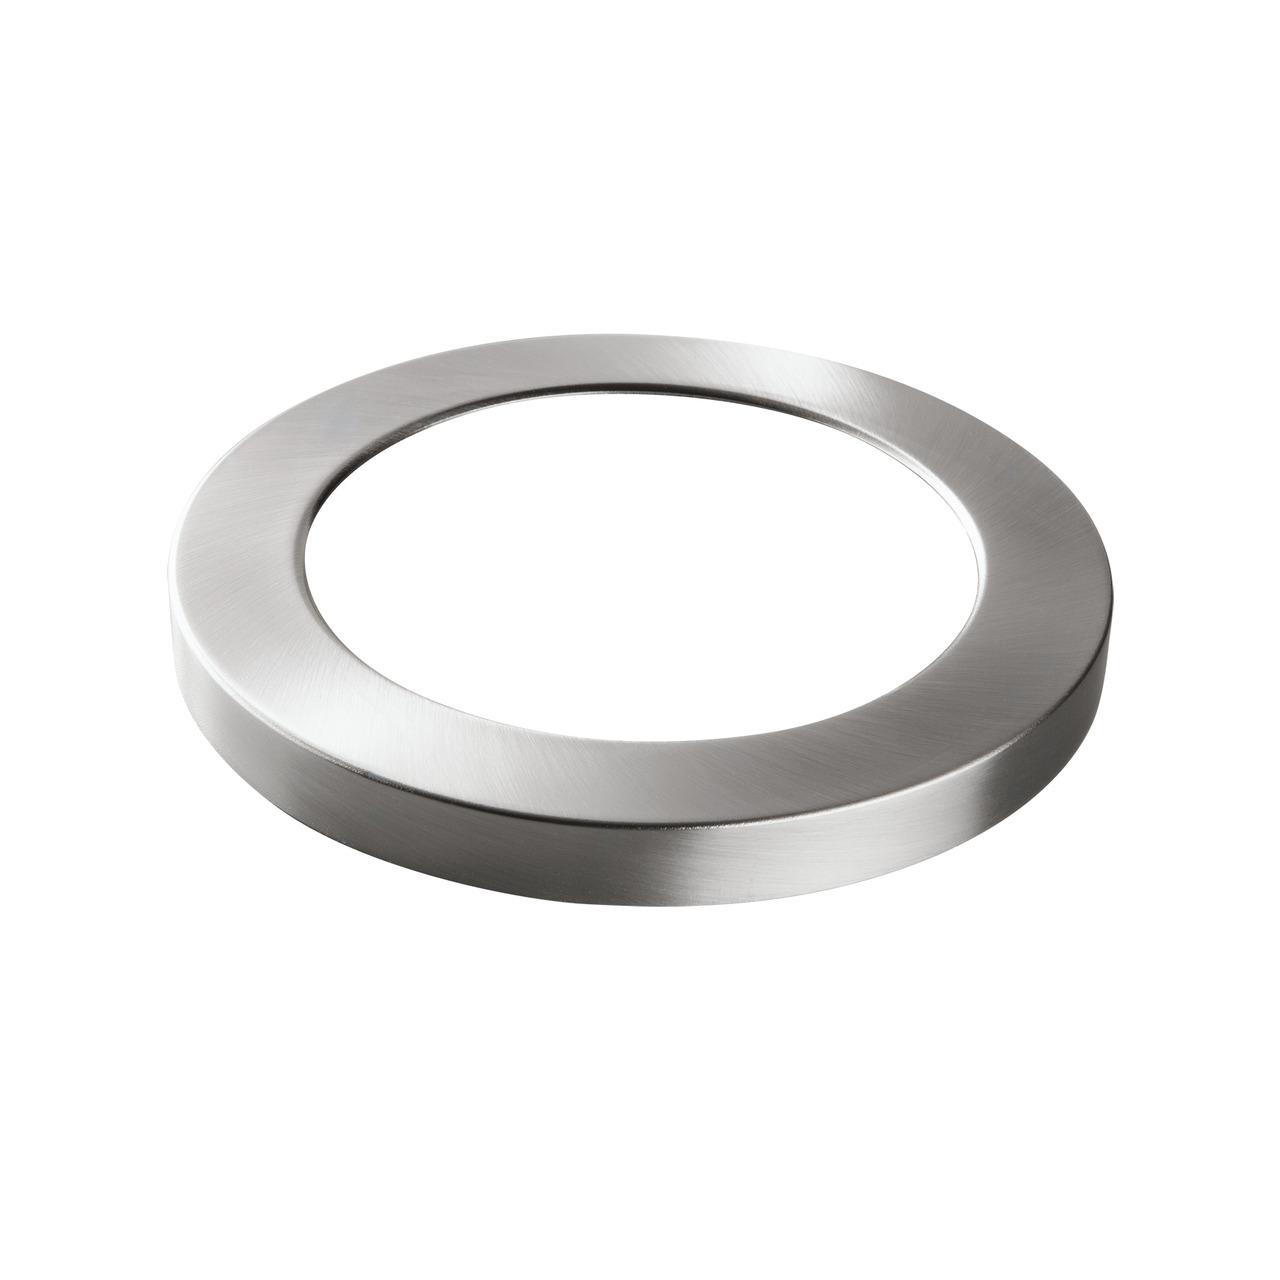 HEITRONIC Metallring fund-252 r LED-Panel SELESTO- nickel matt